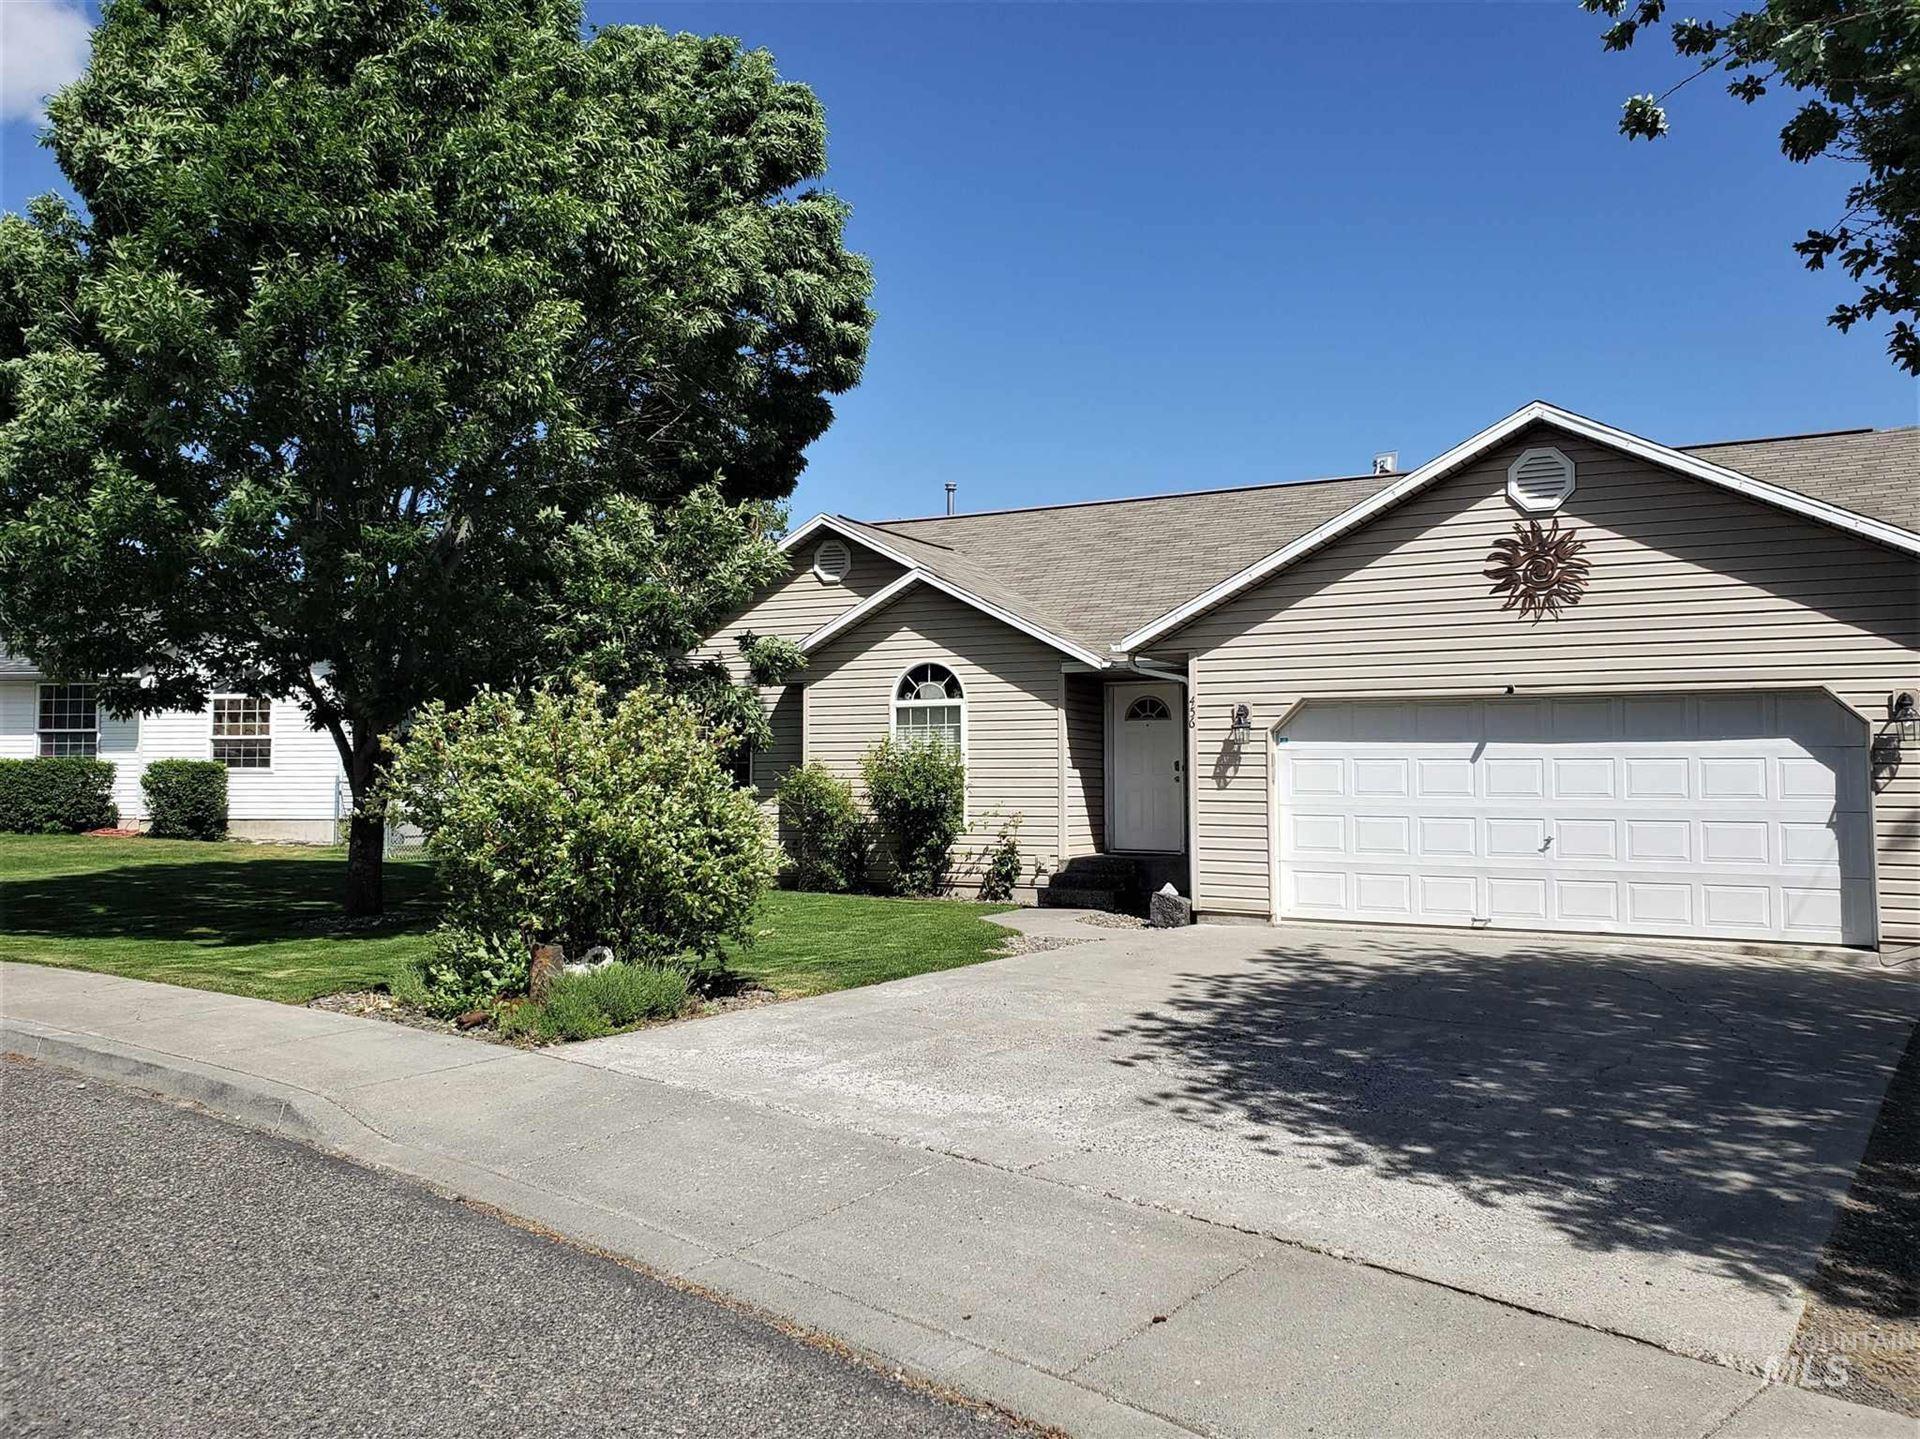 Photo of 456 E Valleyview, Genesee, ID 83832 (MLS # 98806289)